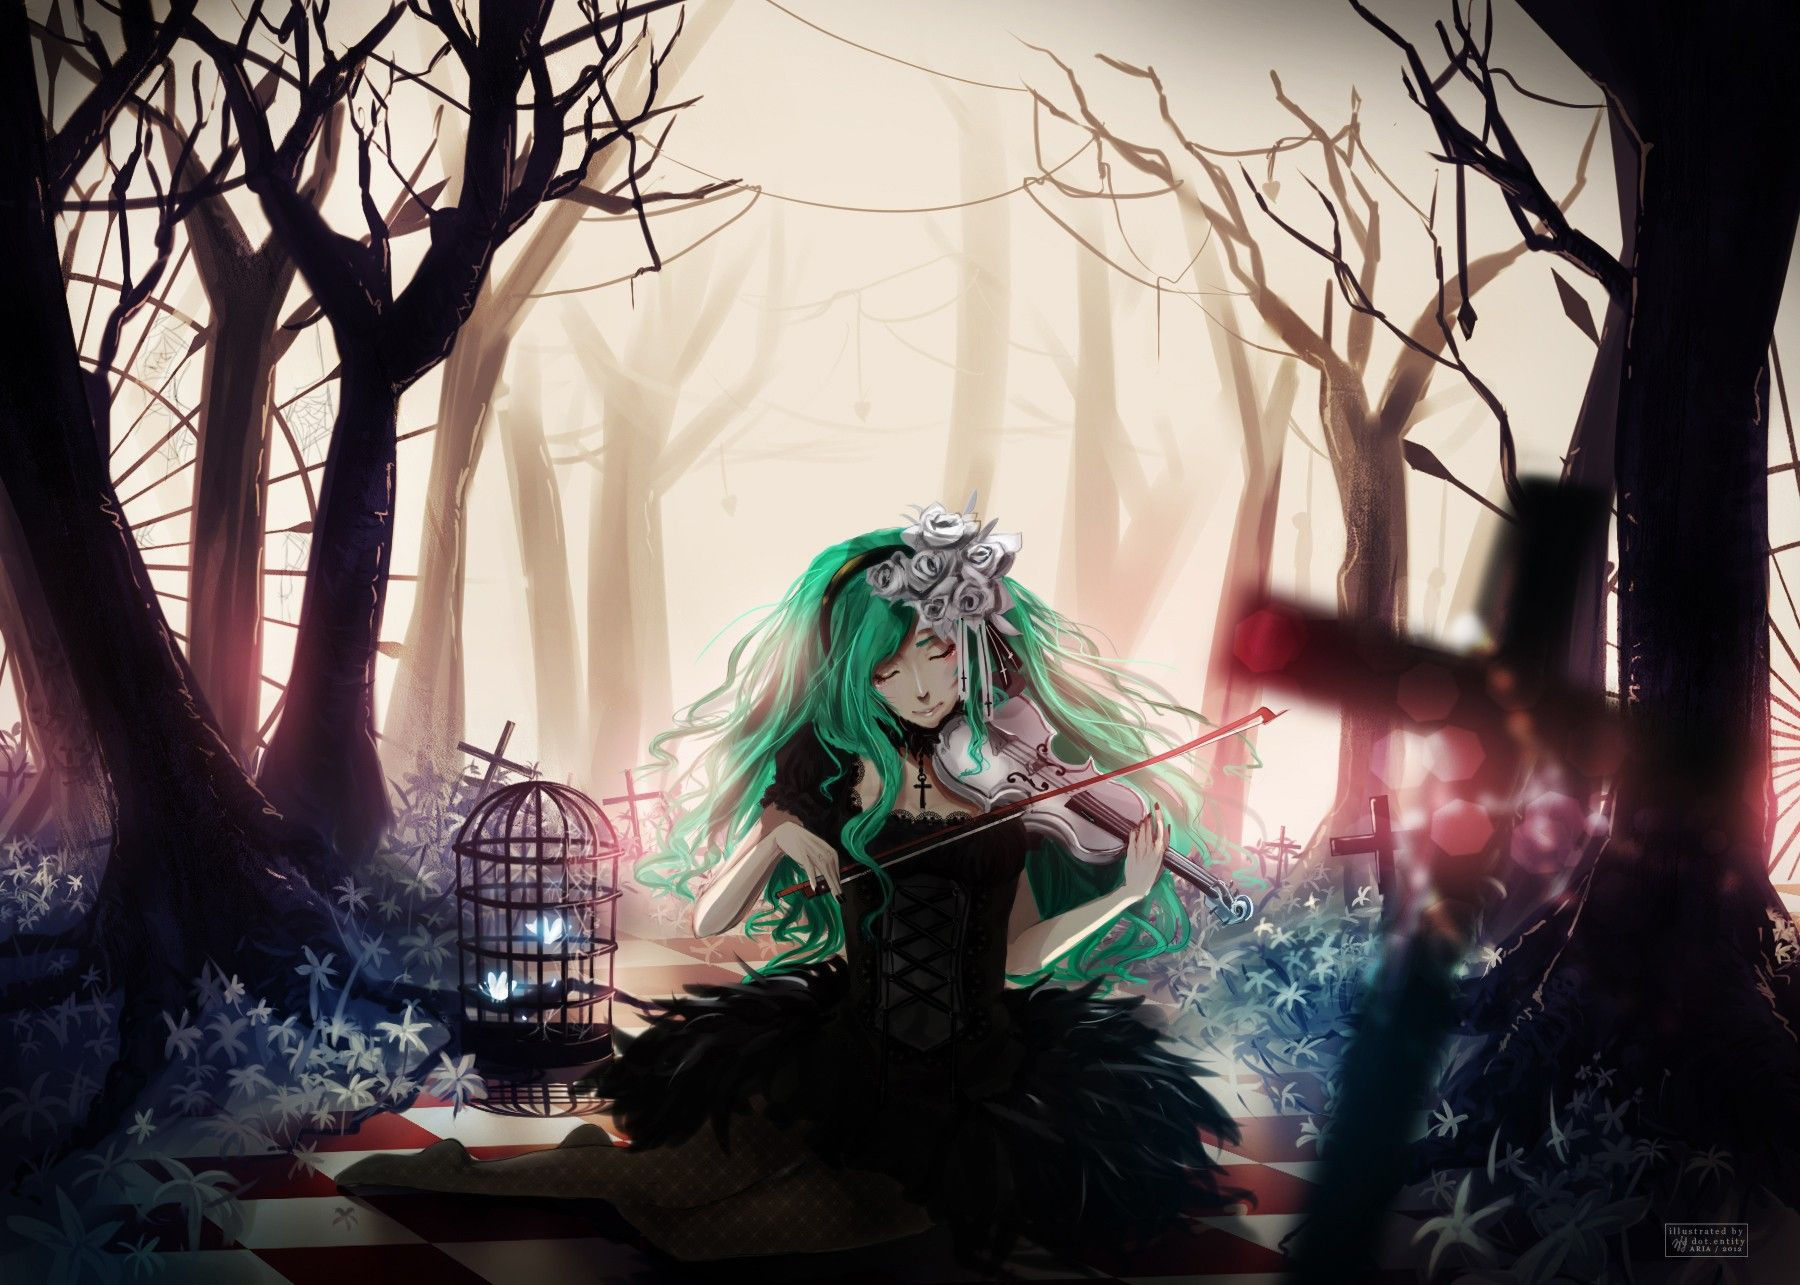 Download Anime Girl Wallpaper 1333×1000 Full HD Wallpapers